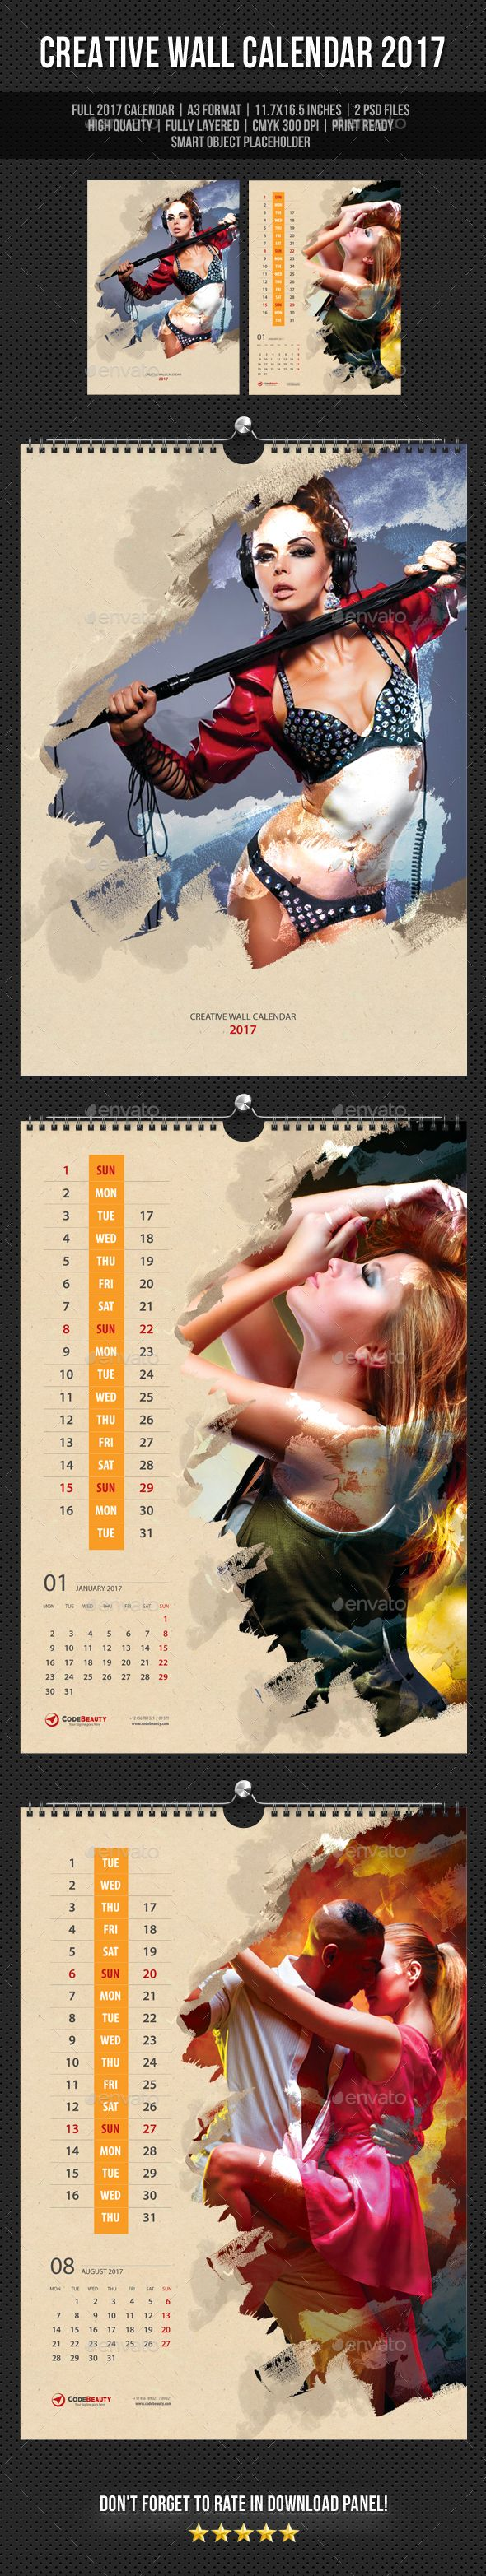 Creative Wall Calendar 2017 Template PSD